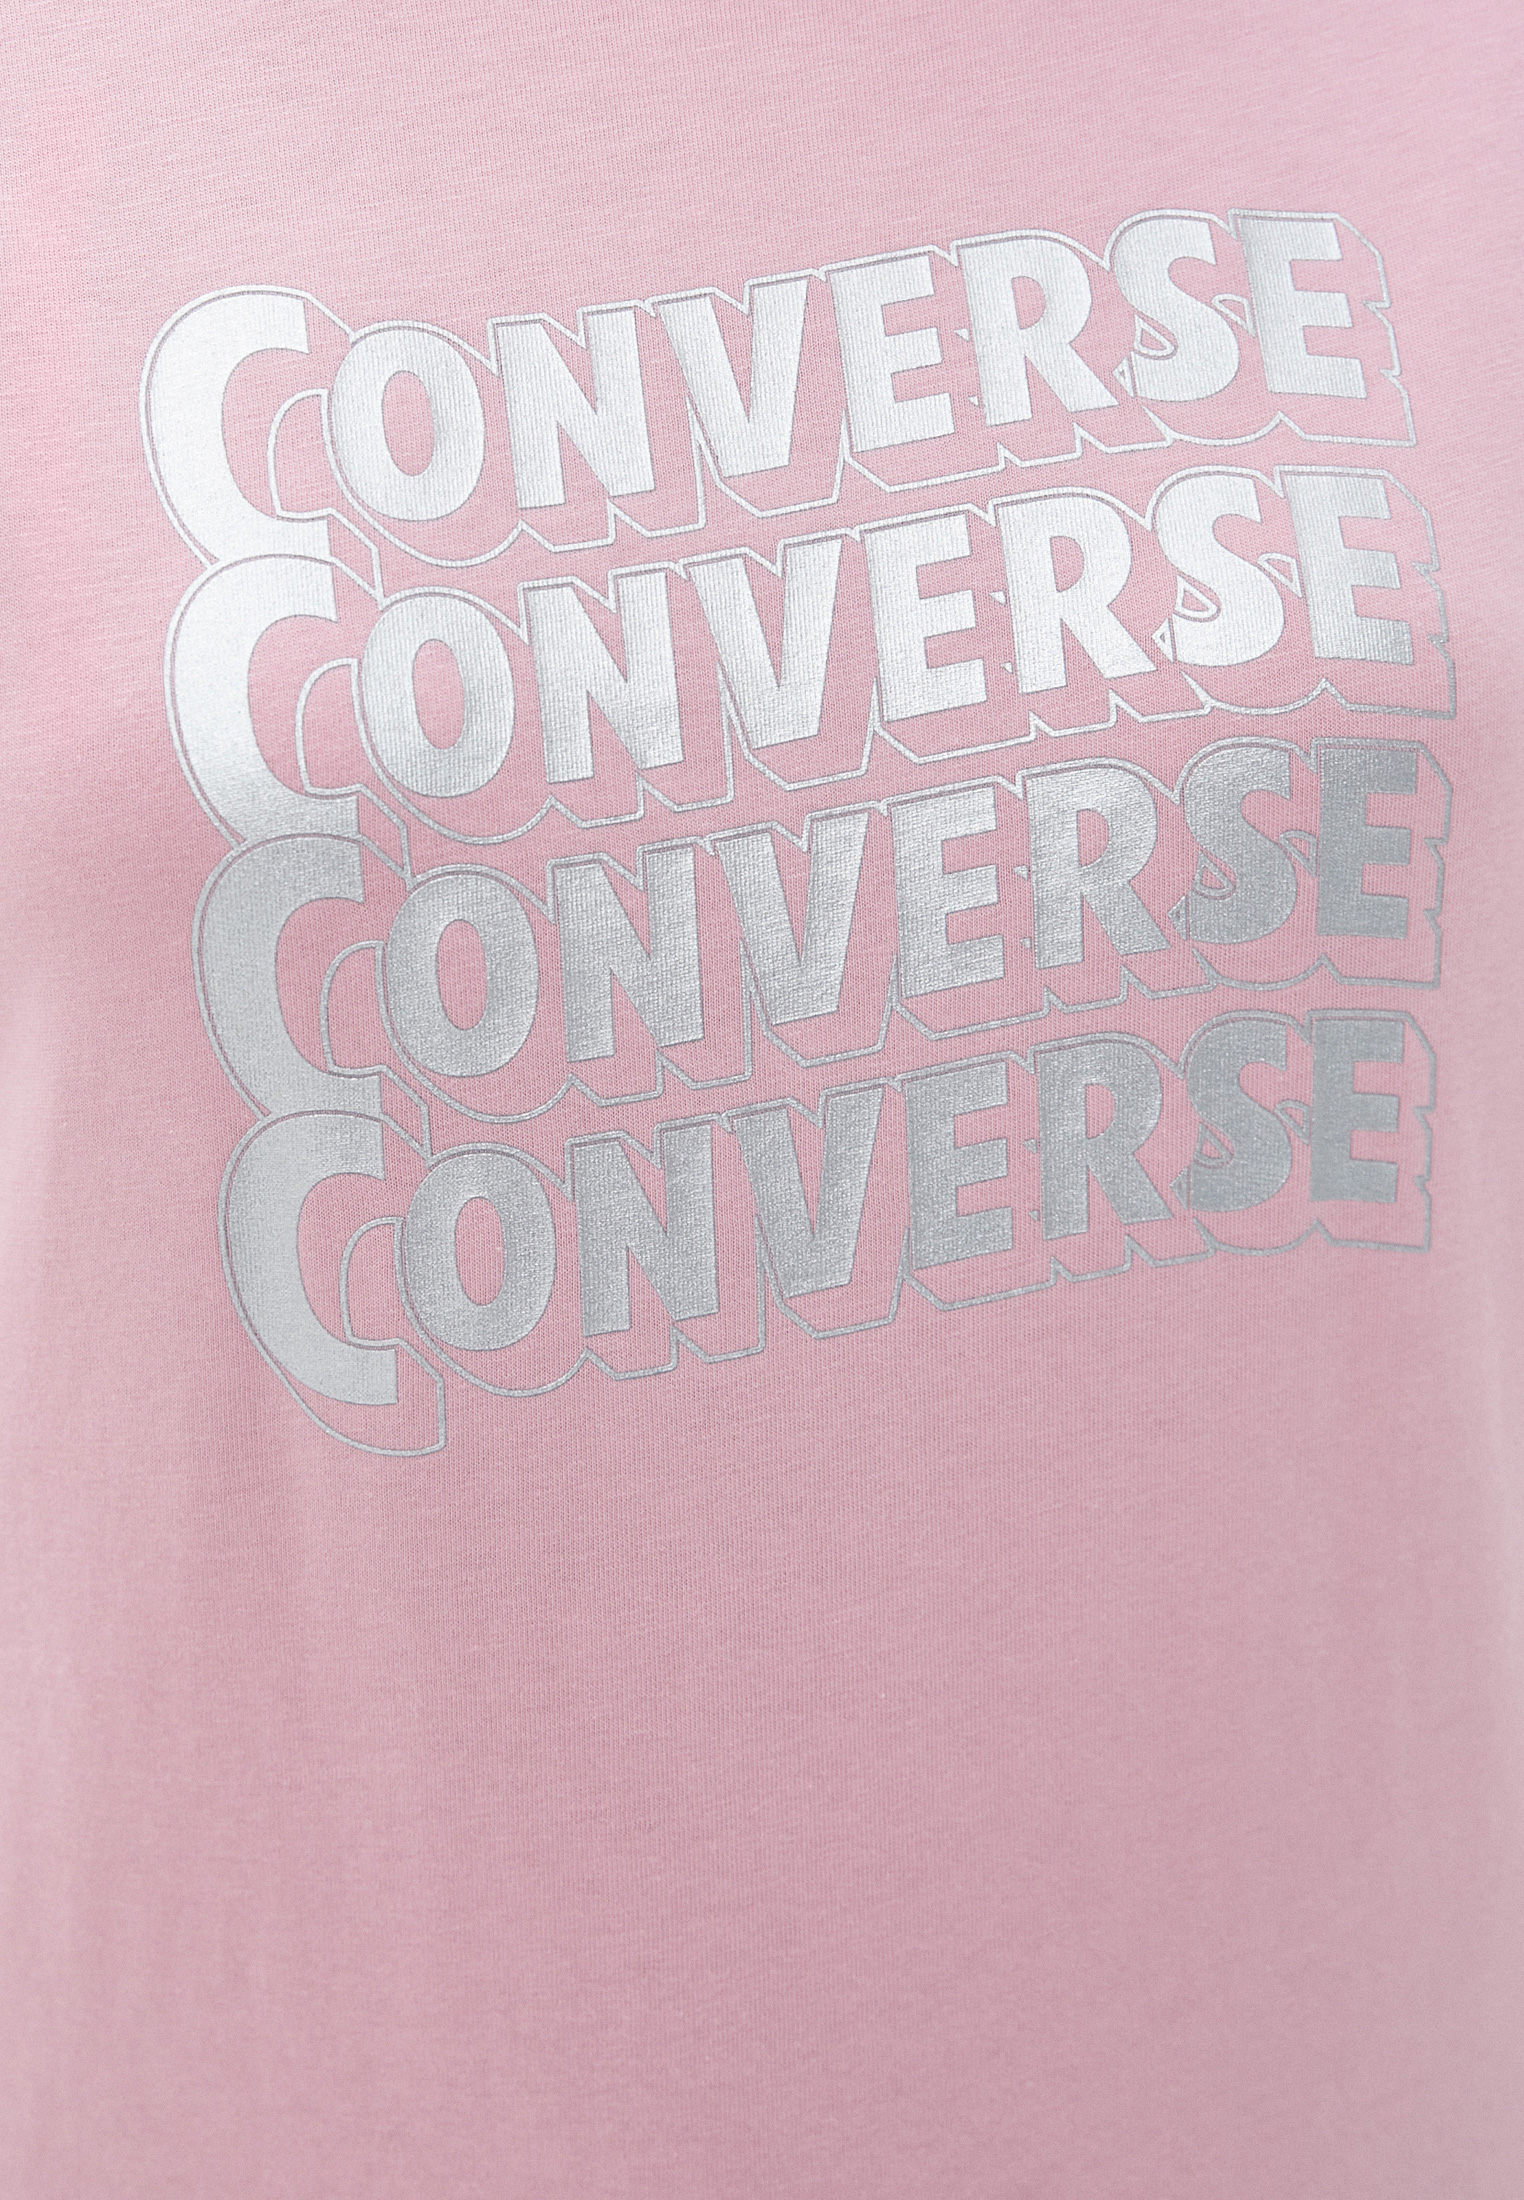 Футболка с коротким рукавом Converse (Конверс) 10020553690: изображение 3